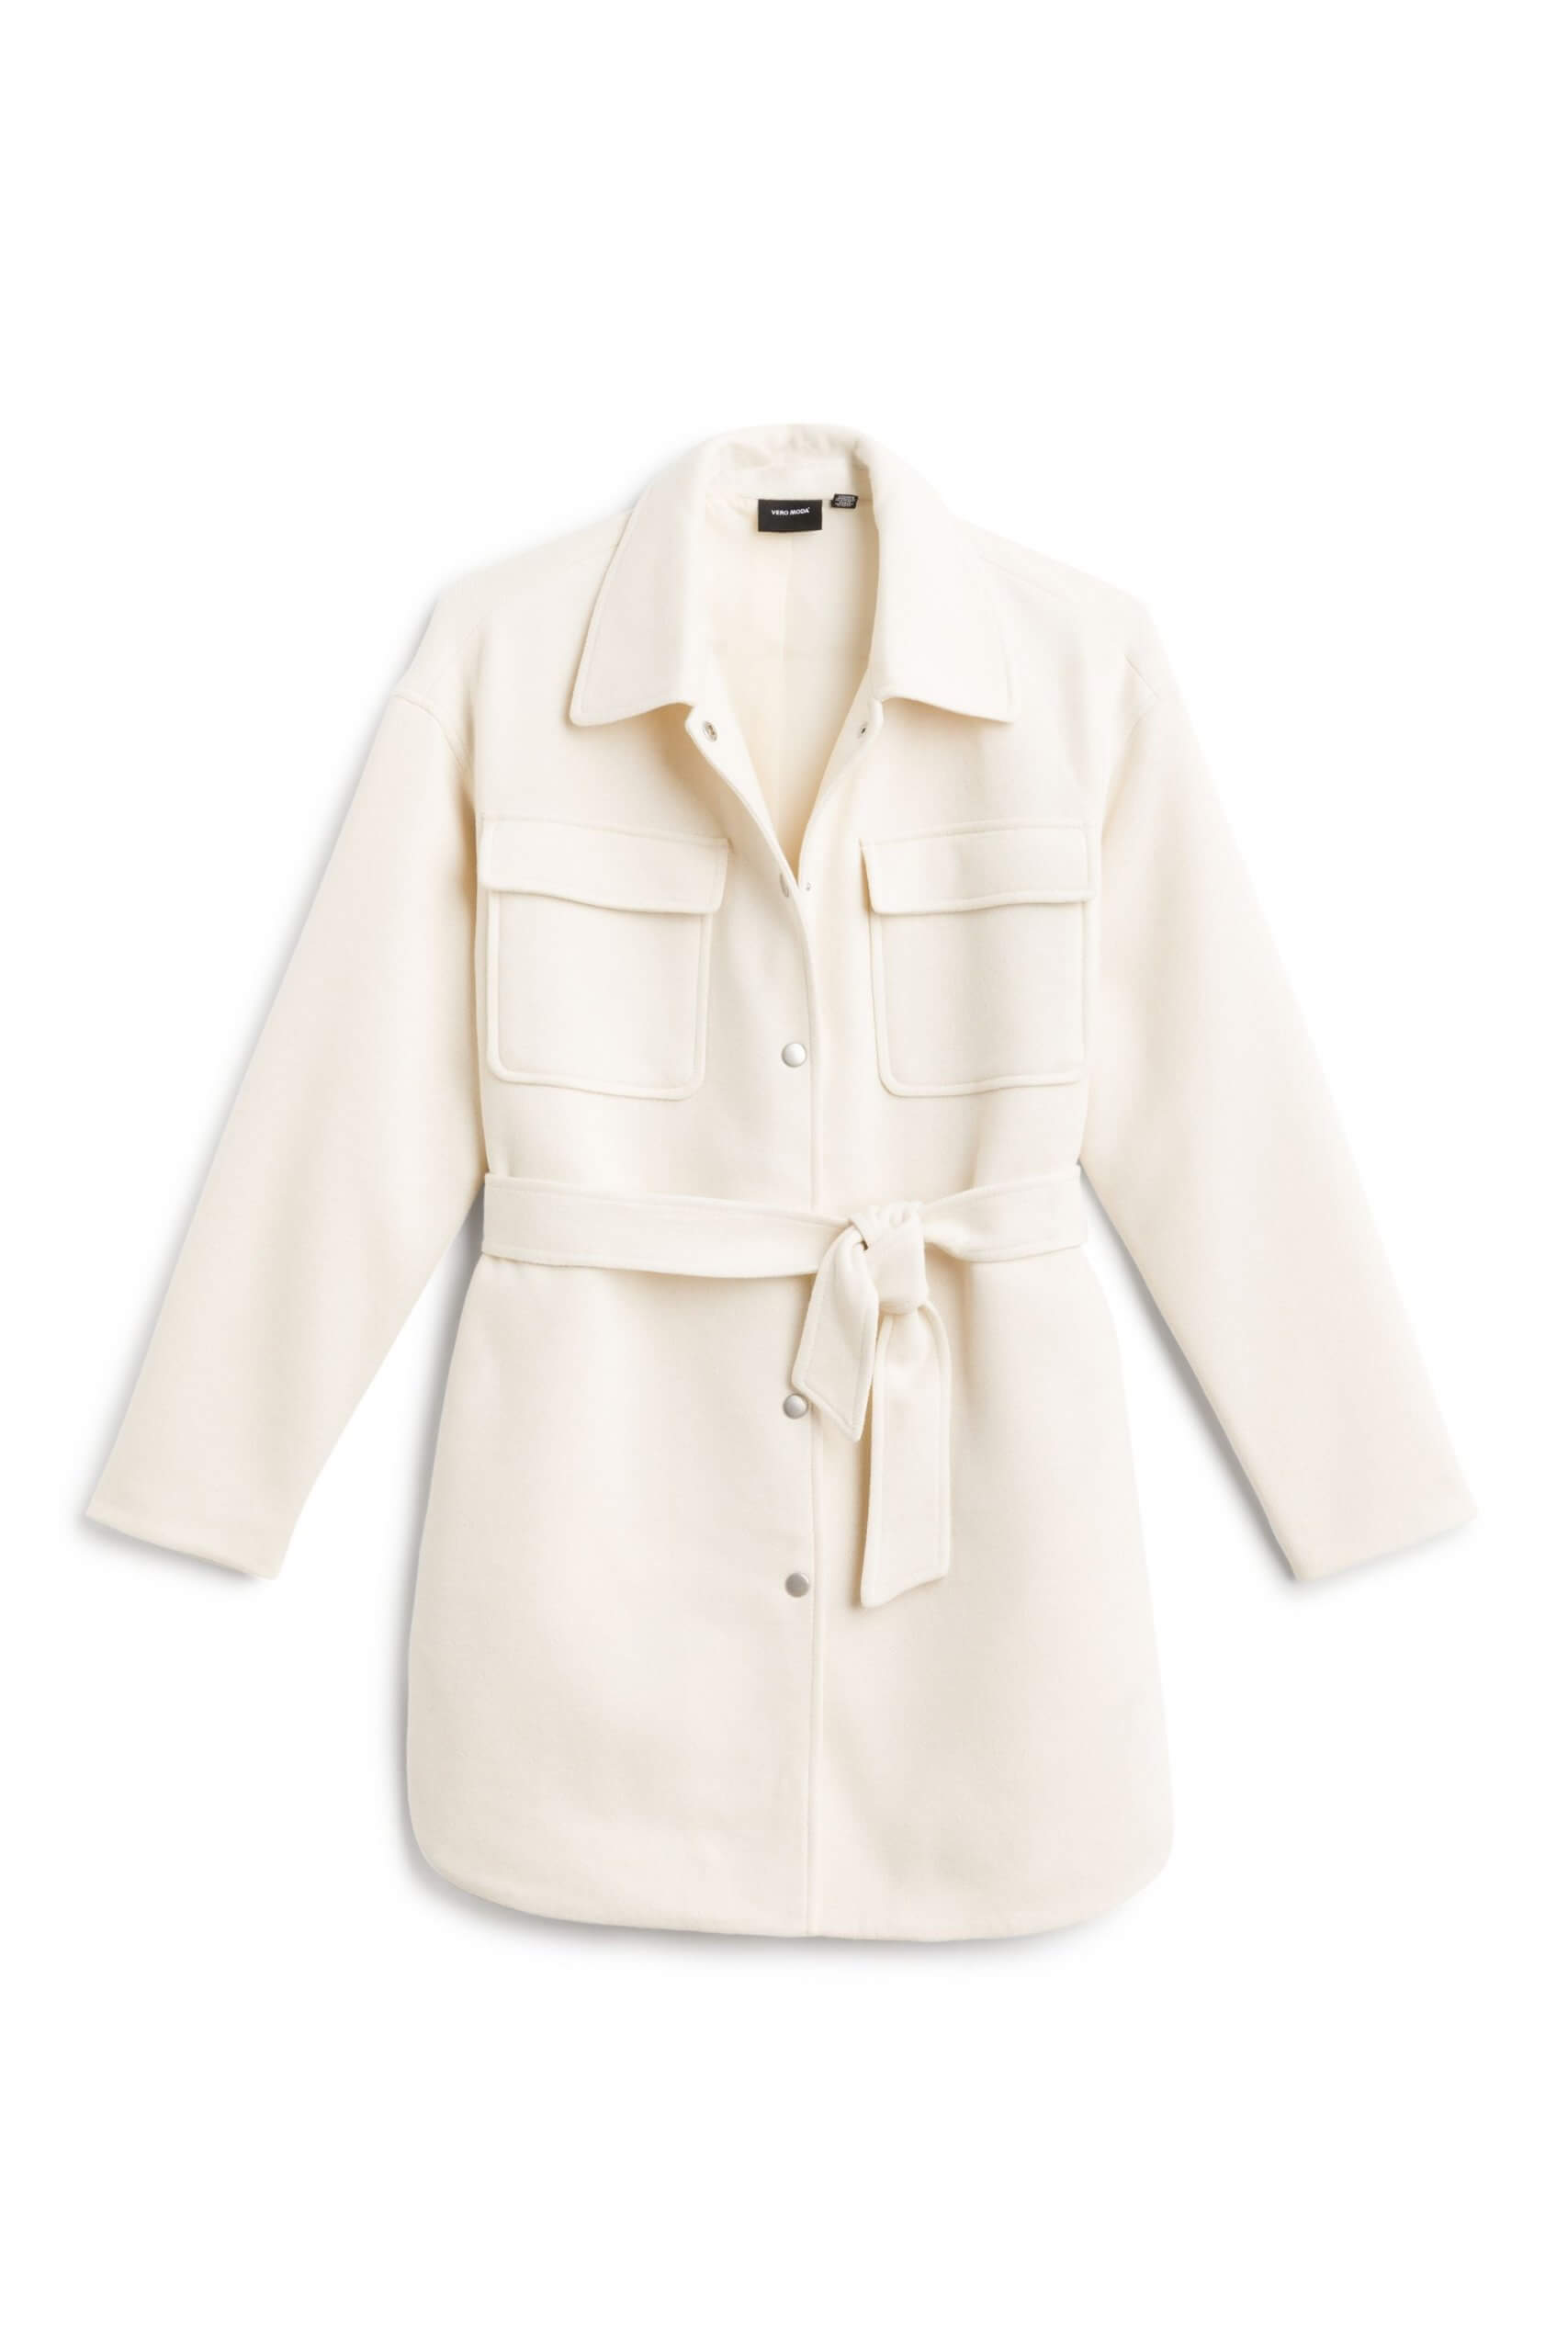 Stitch Fix Women's cream tie-waist coat.